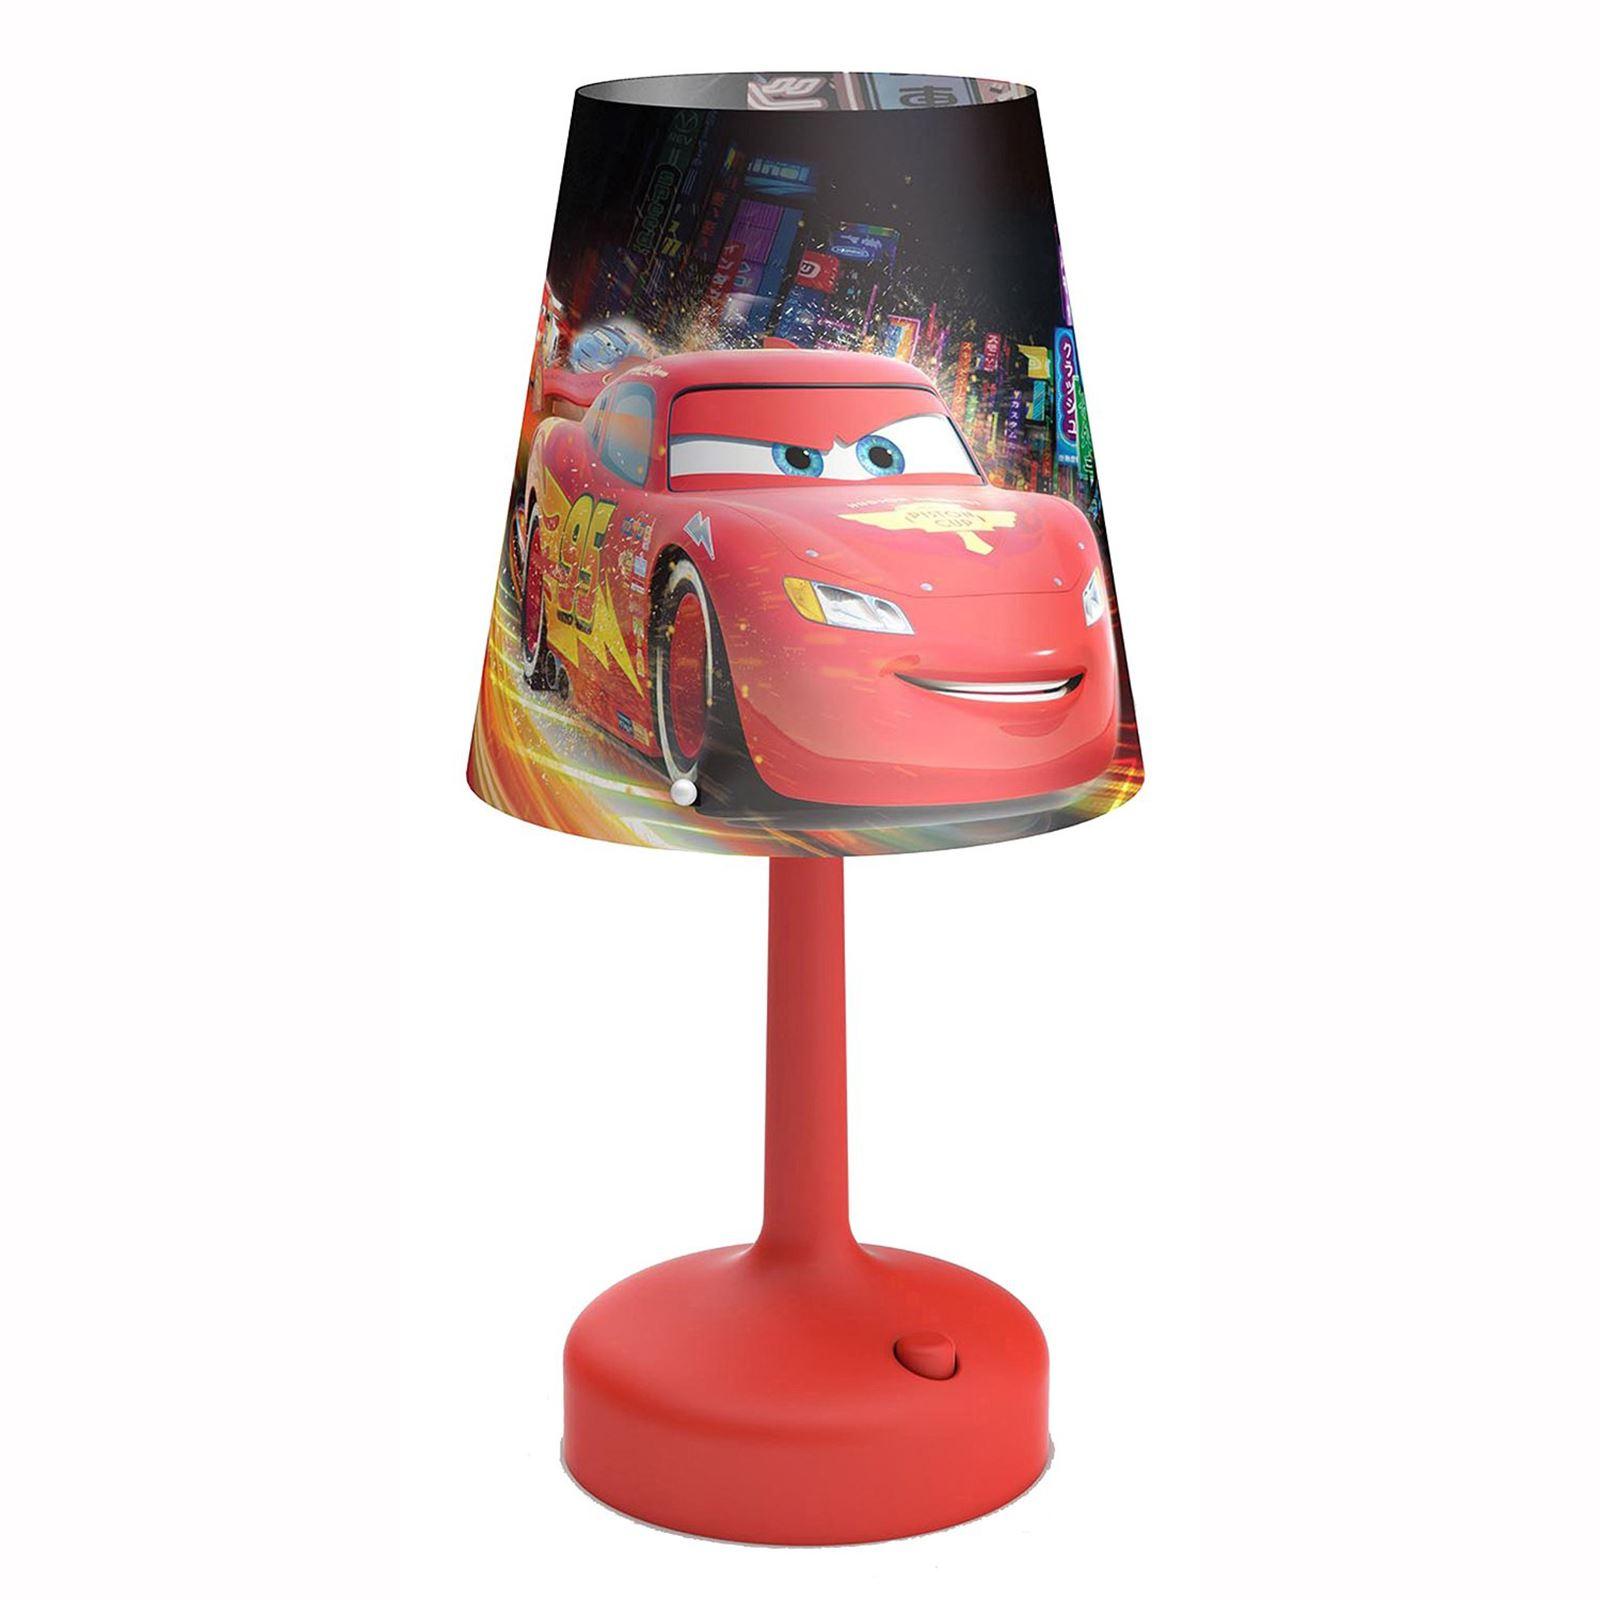 Disney Cars Portable Desk Table Lamp RED Kids Bedroom Lighting NEW Free P P : eBay